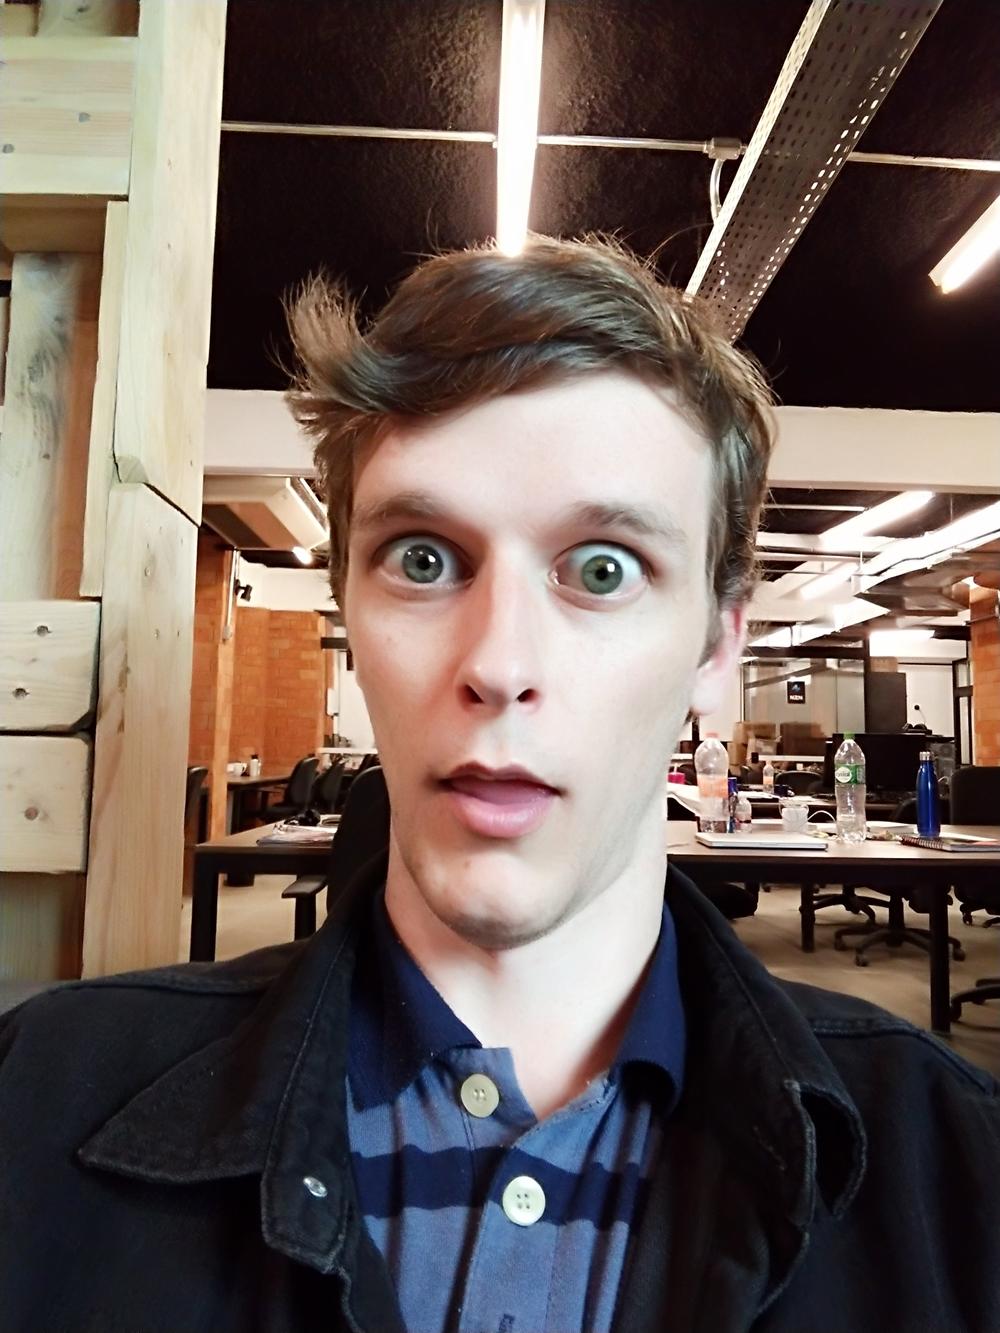 Selfie embelezamento Zenfone 4